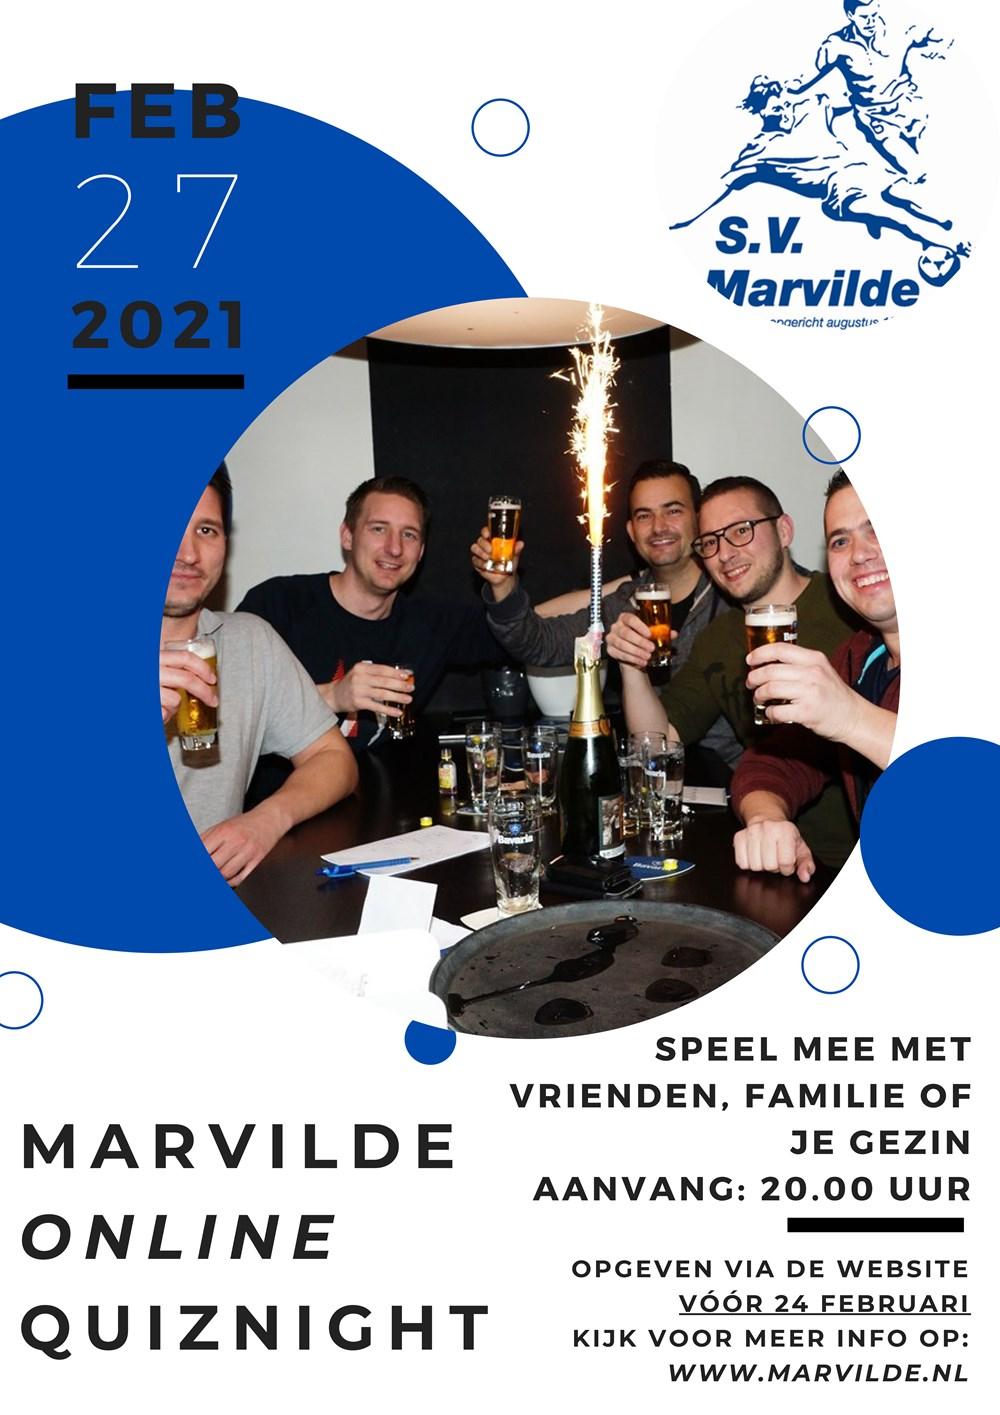 Marvilde_Quiznight_wit.jpg